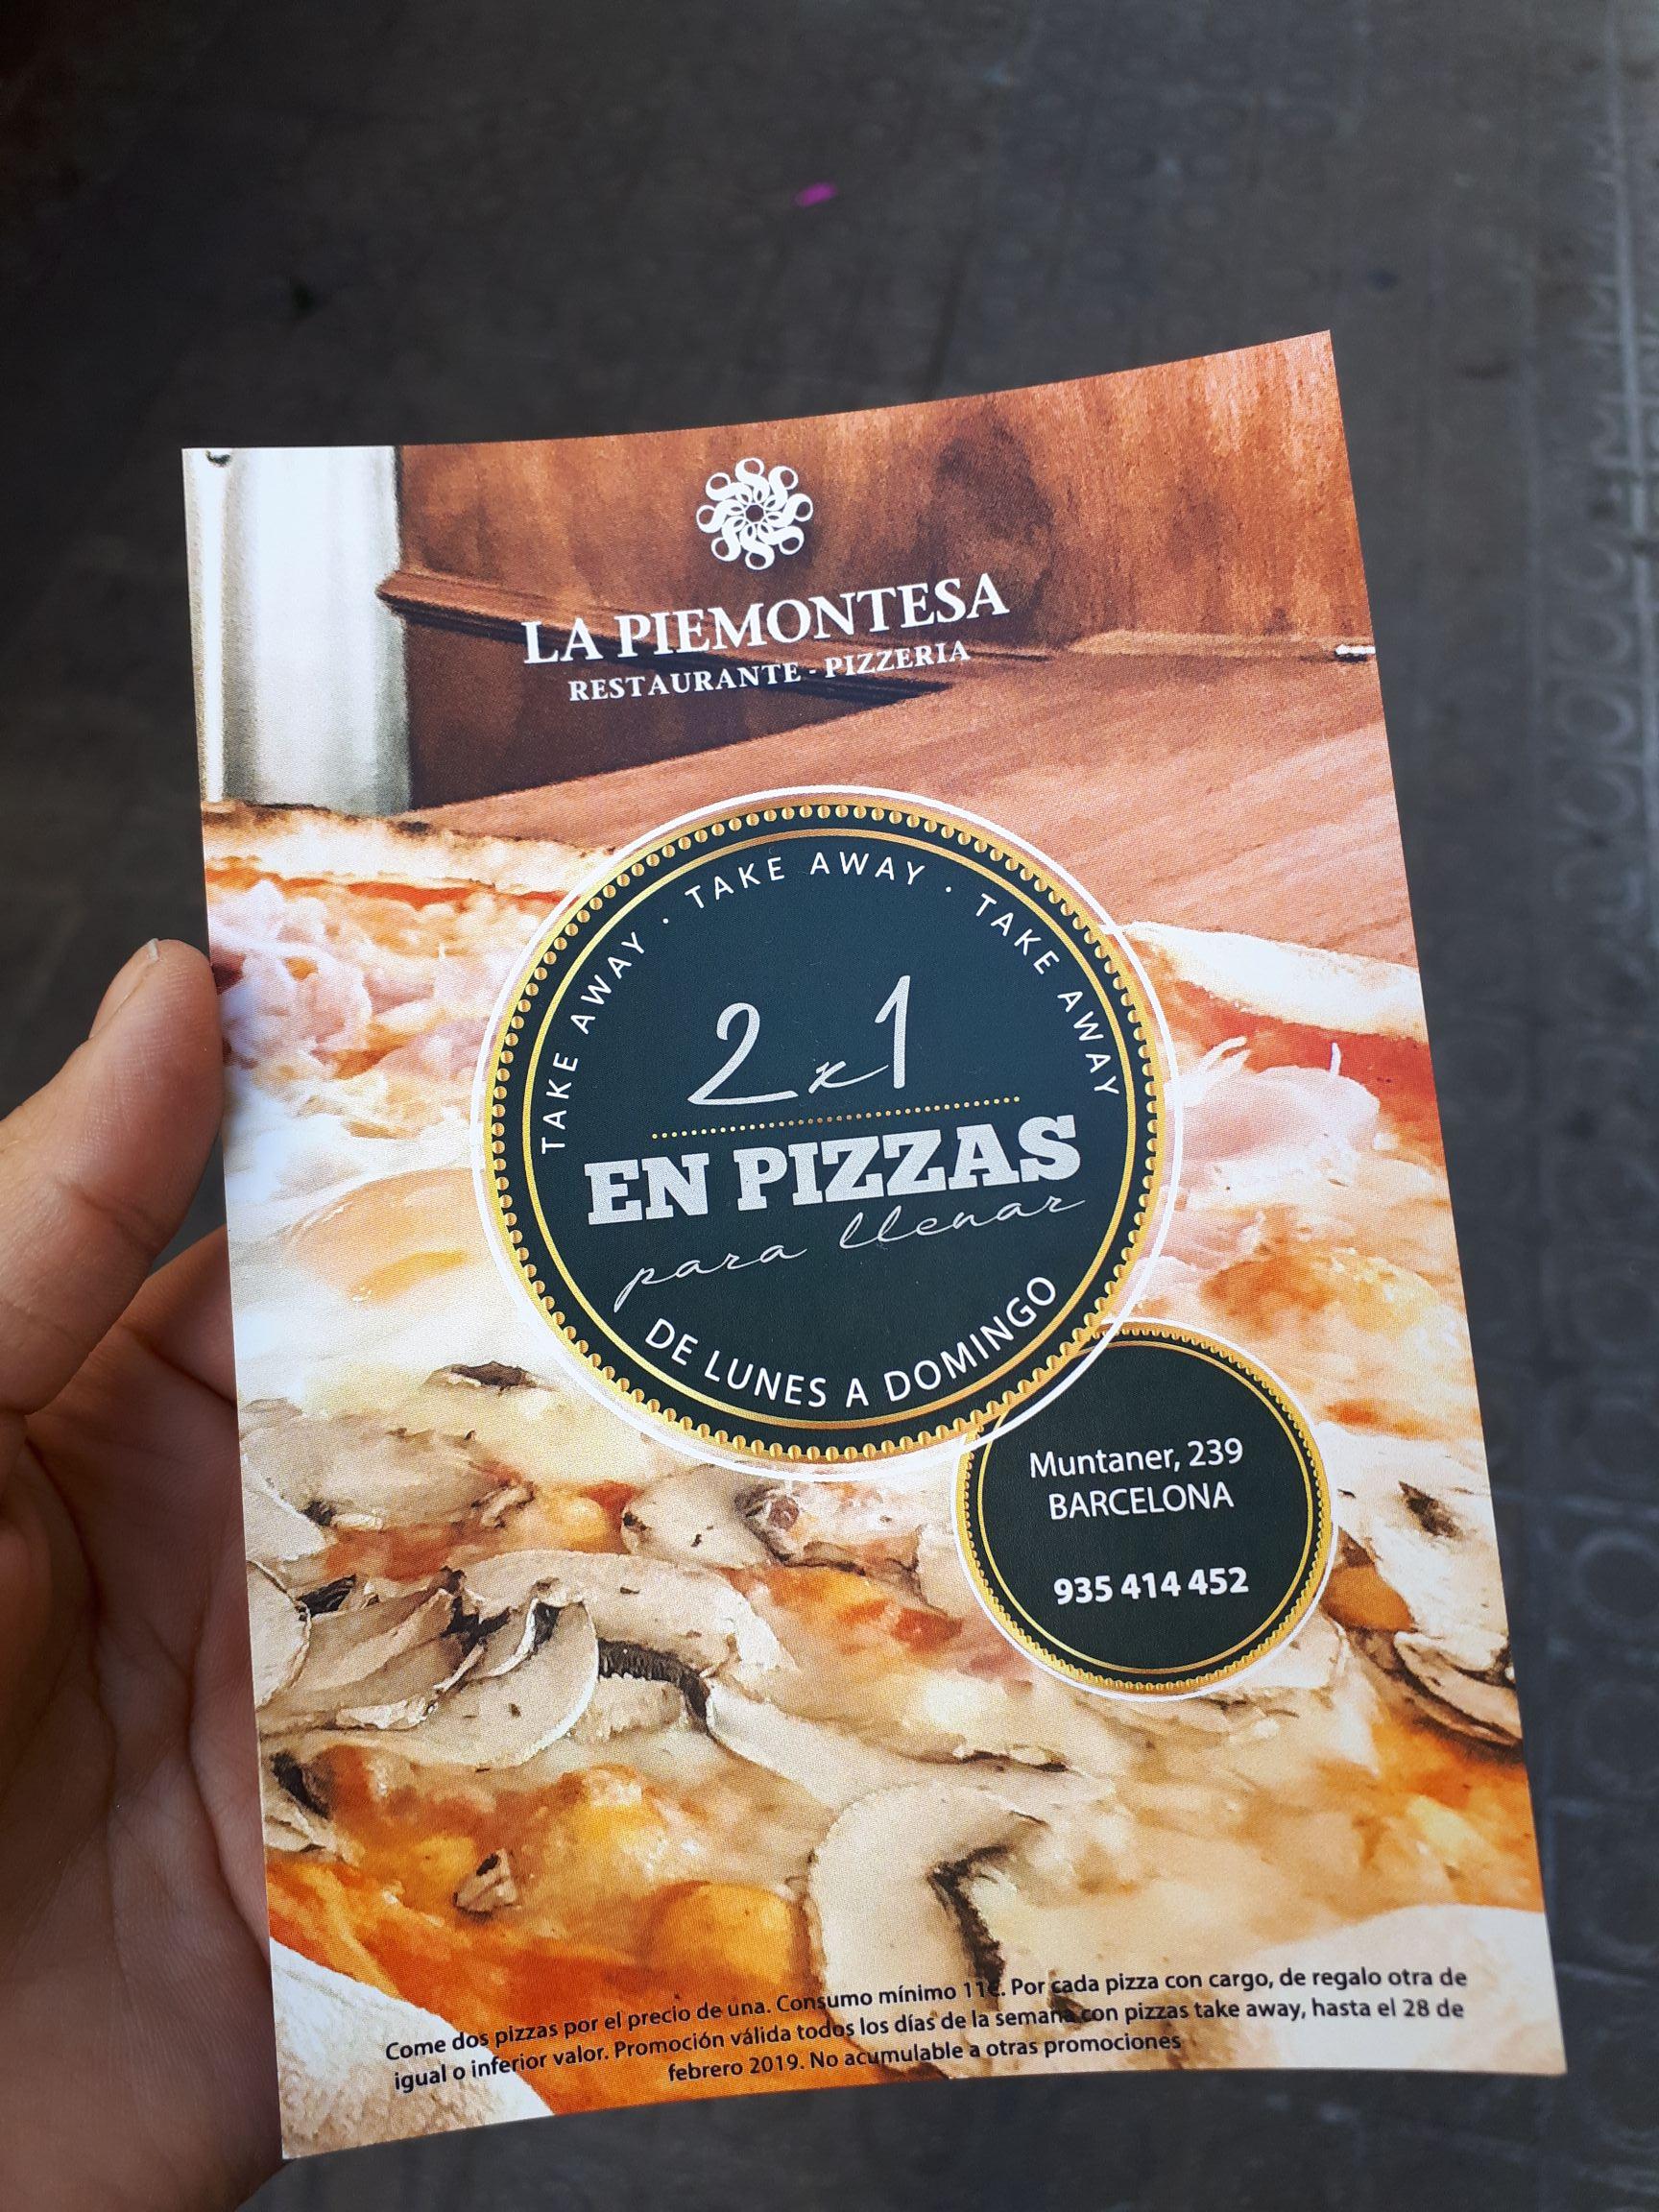 2x1 pizzas artesanas Barcelona/ Piemontesa